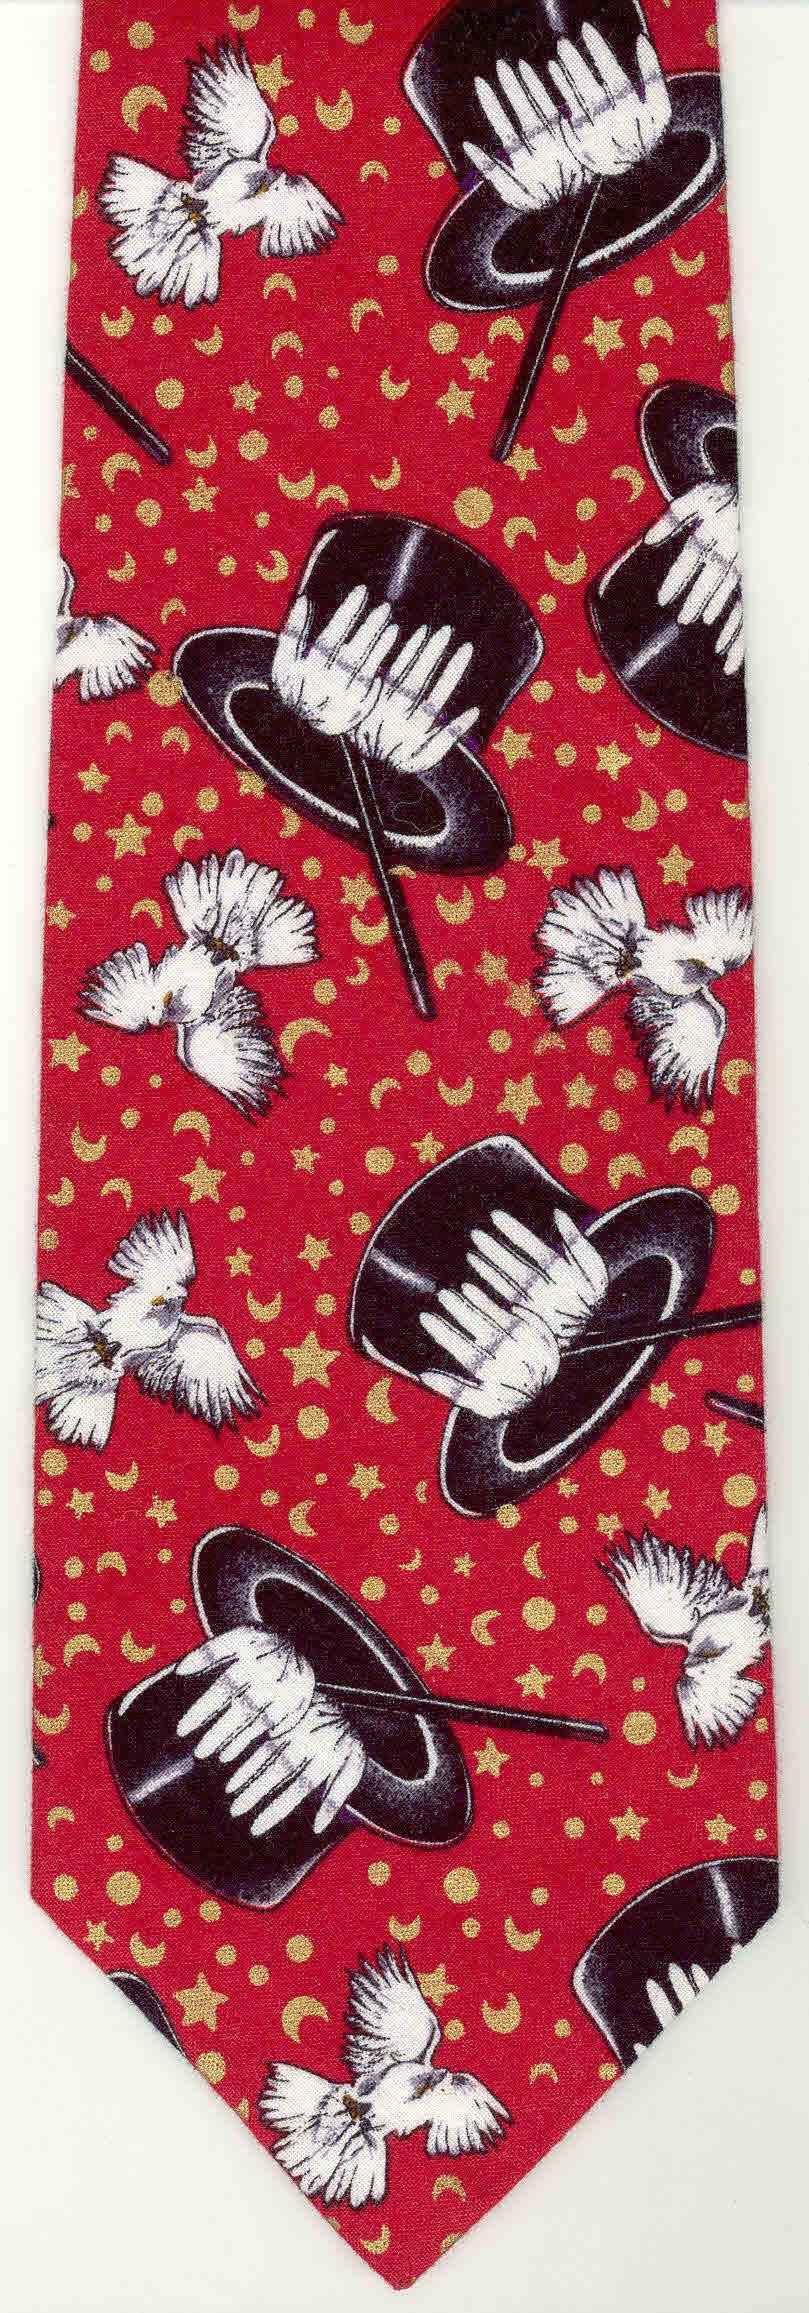 058 Cloth Top Hats.jpg